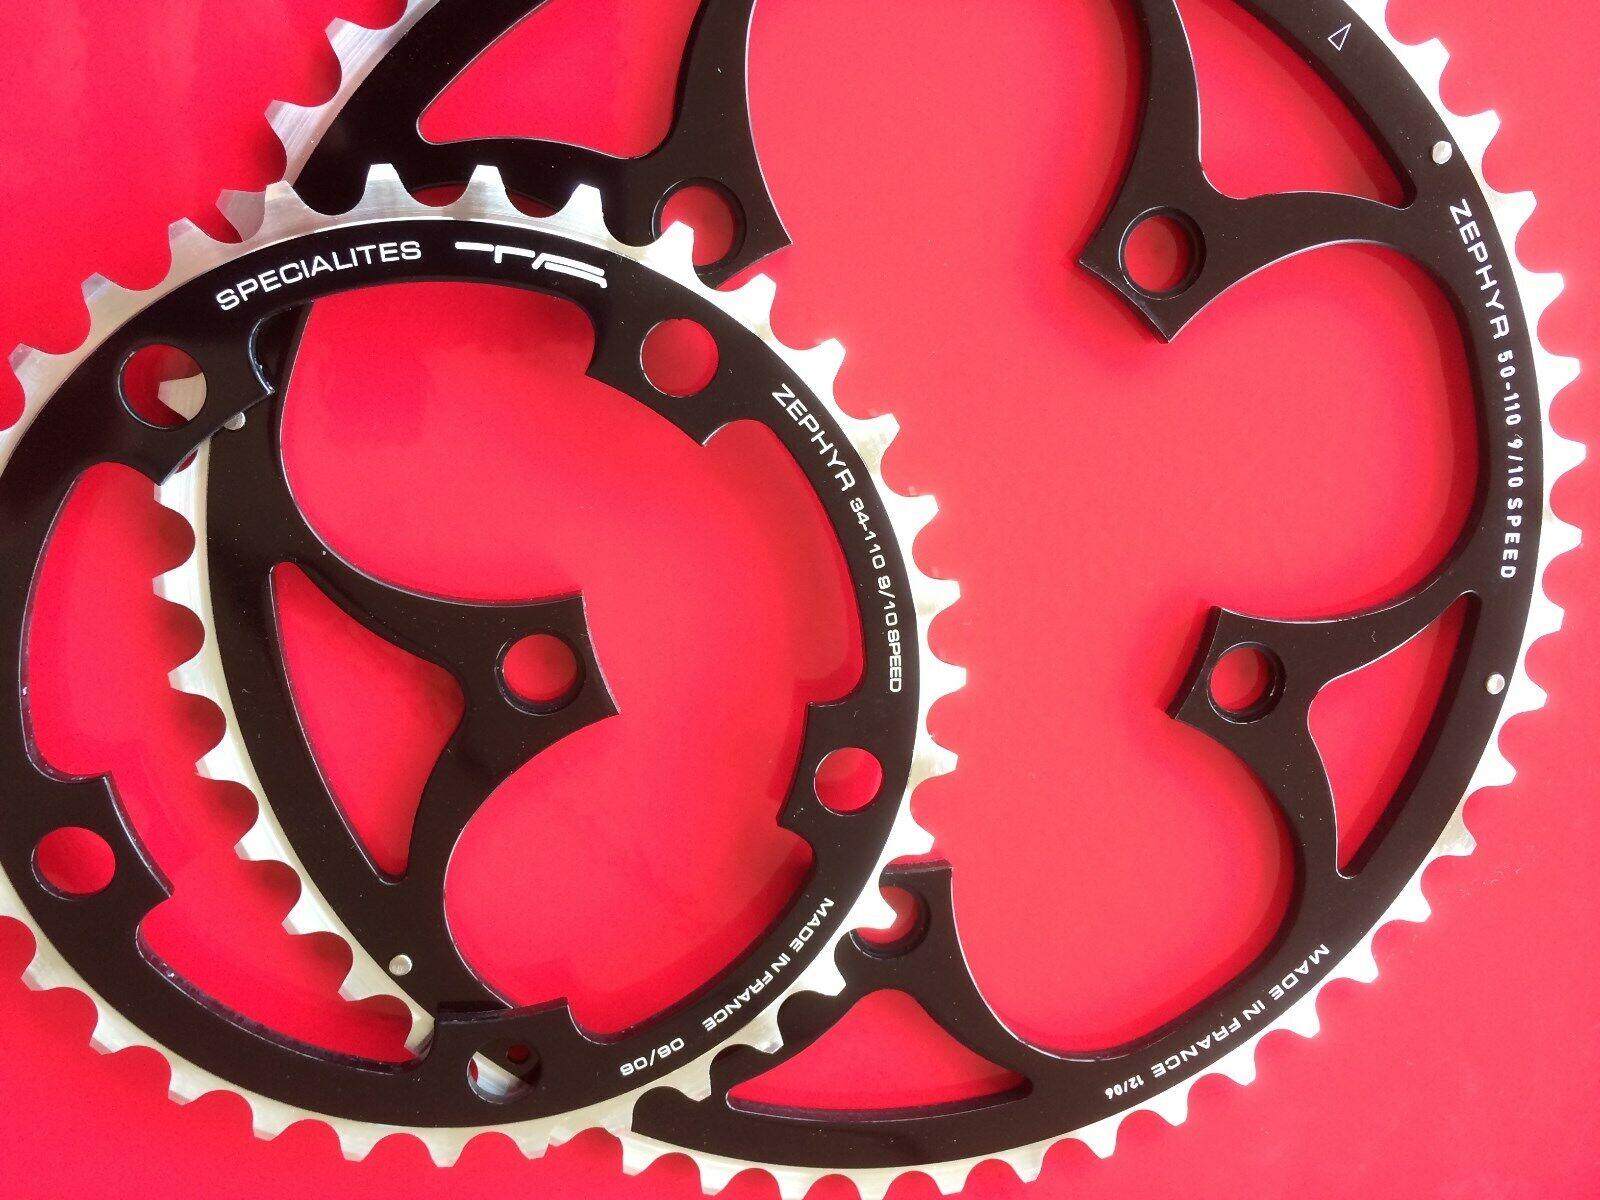 NUOVO 2x TA Zephyr INGRANAGGI 3450t COMPACT CHAIN RING 910s Shimano Road Bike